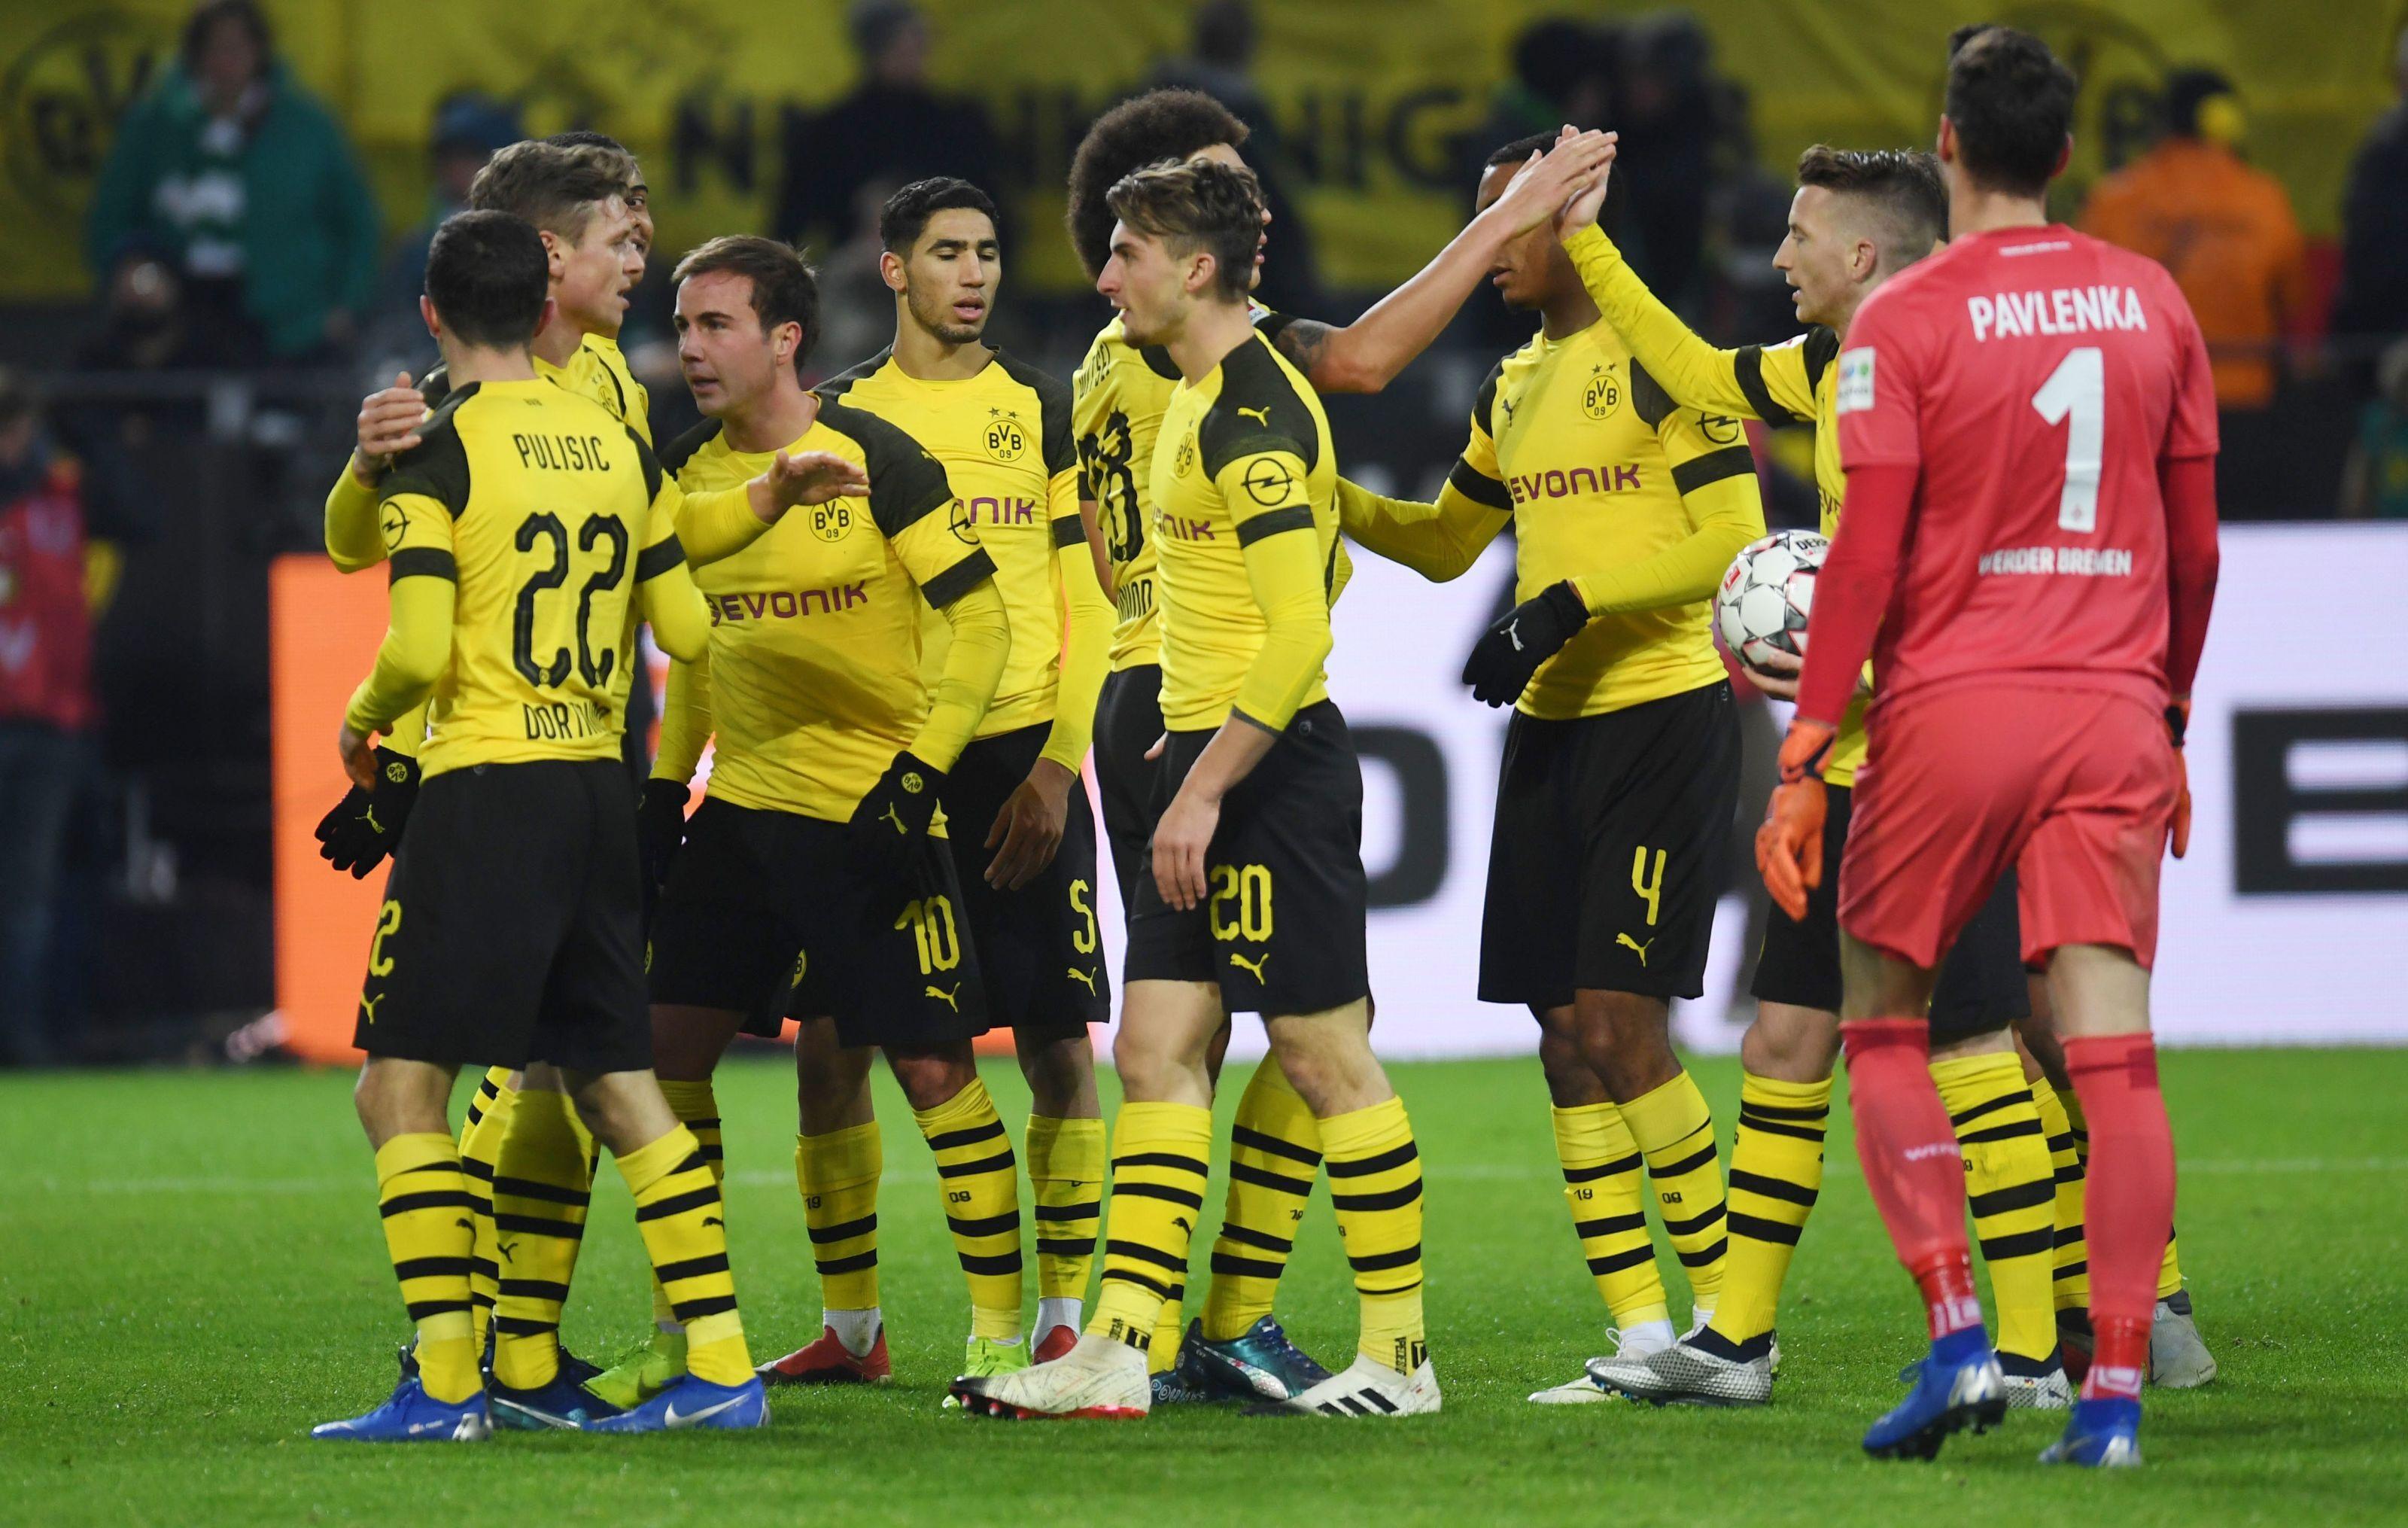 Fortuna Dusseldorf Vs Borussia Dortmund Expected Starting Xi